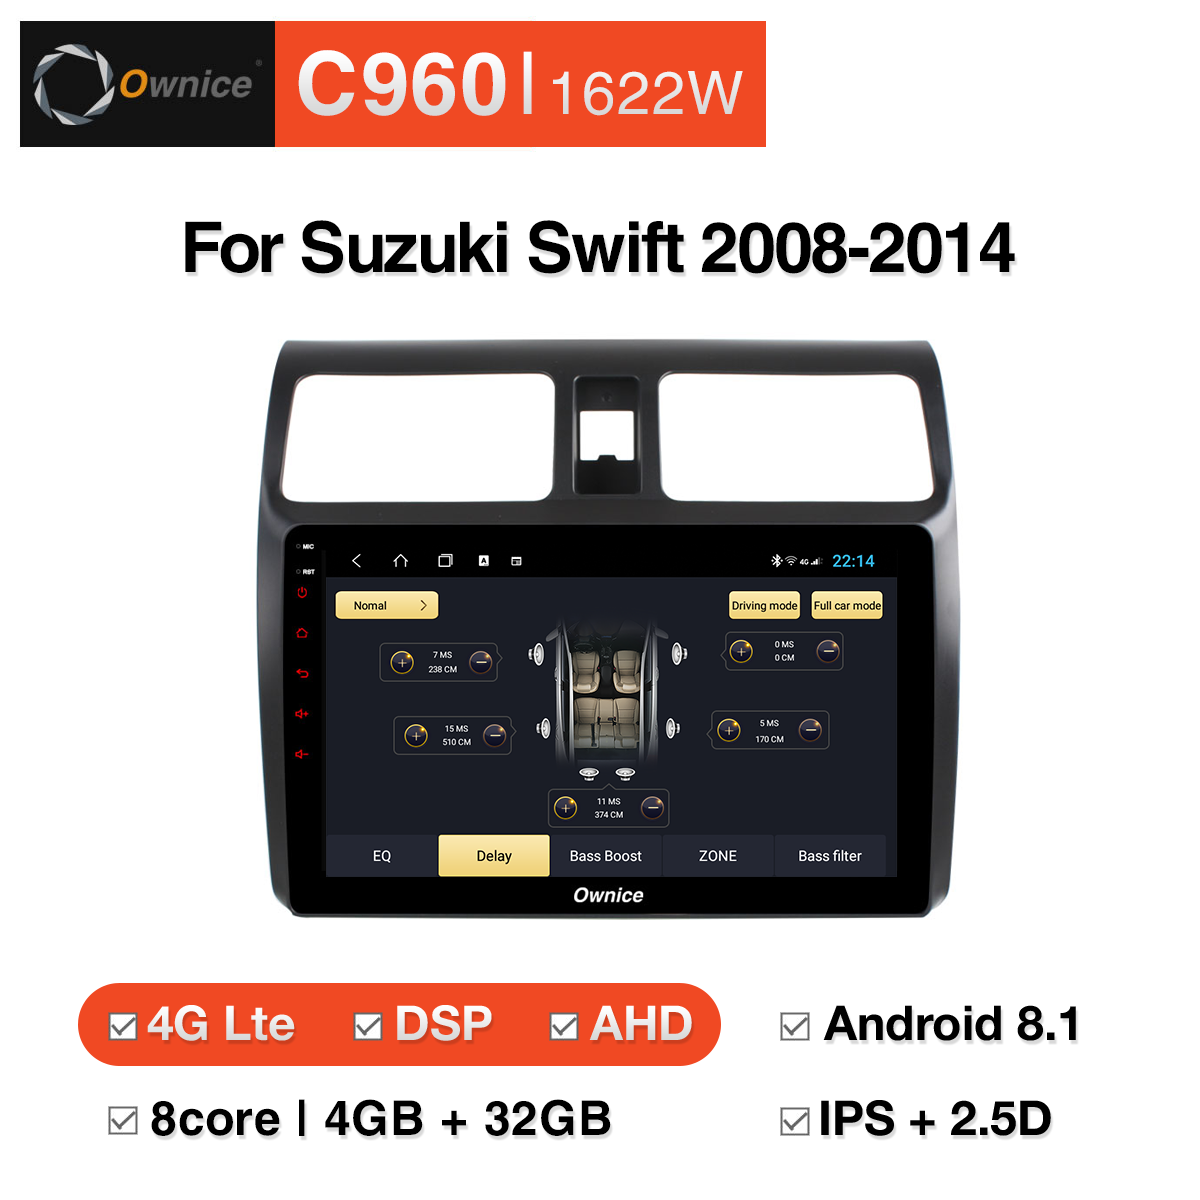 Đầu DVD android Ownice C960 cho xe ô tô Suzuki Swift 2008-2014:: OL-1622W